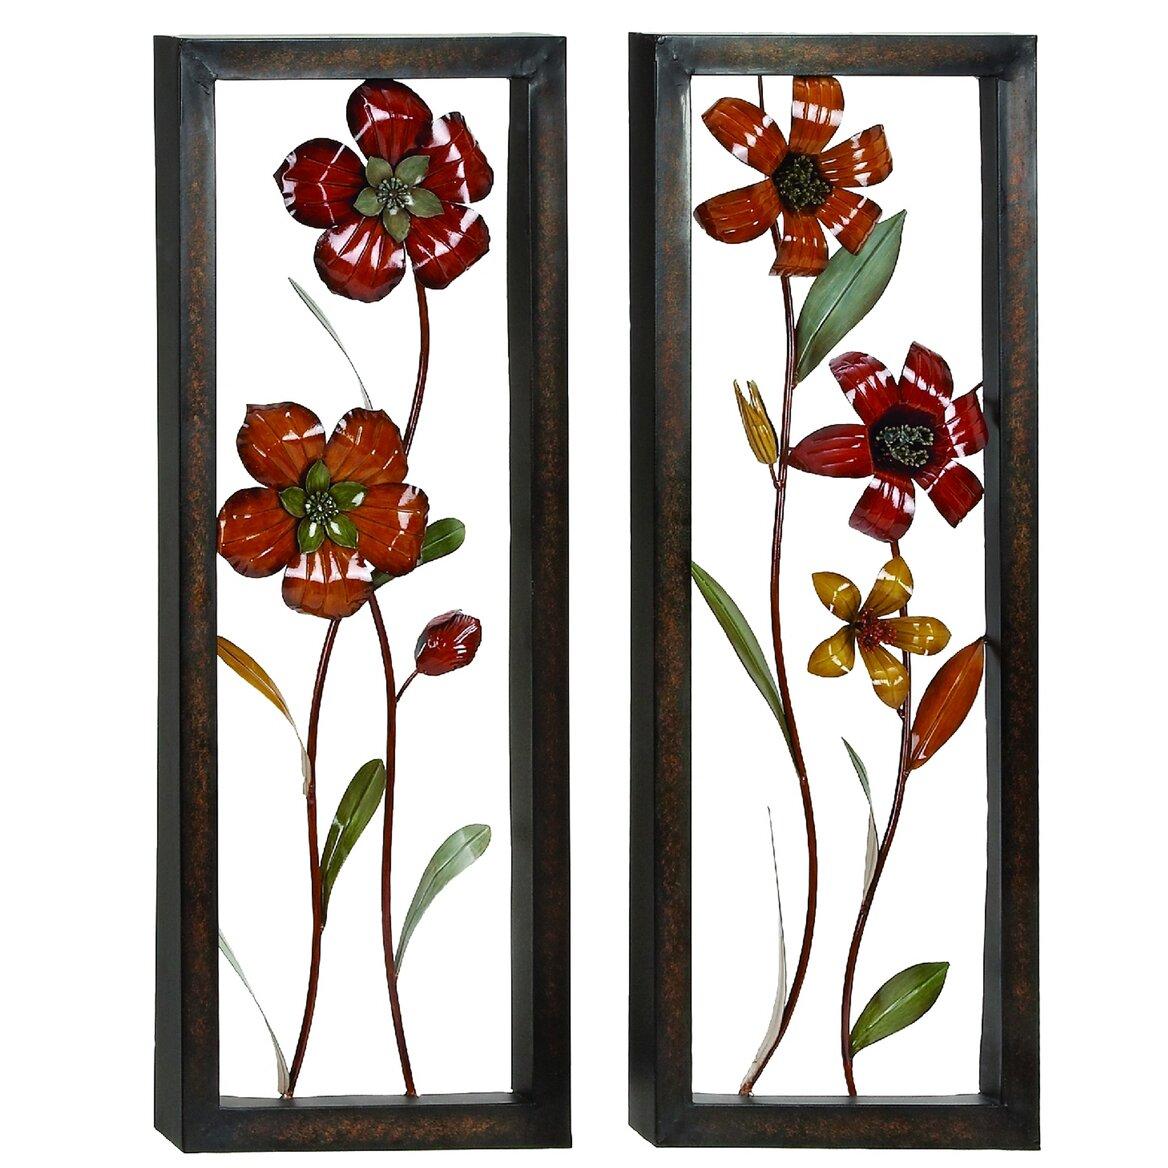 Urban Designs Floral Bloom Pop Out Wall D Cor Wayfair